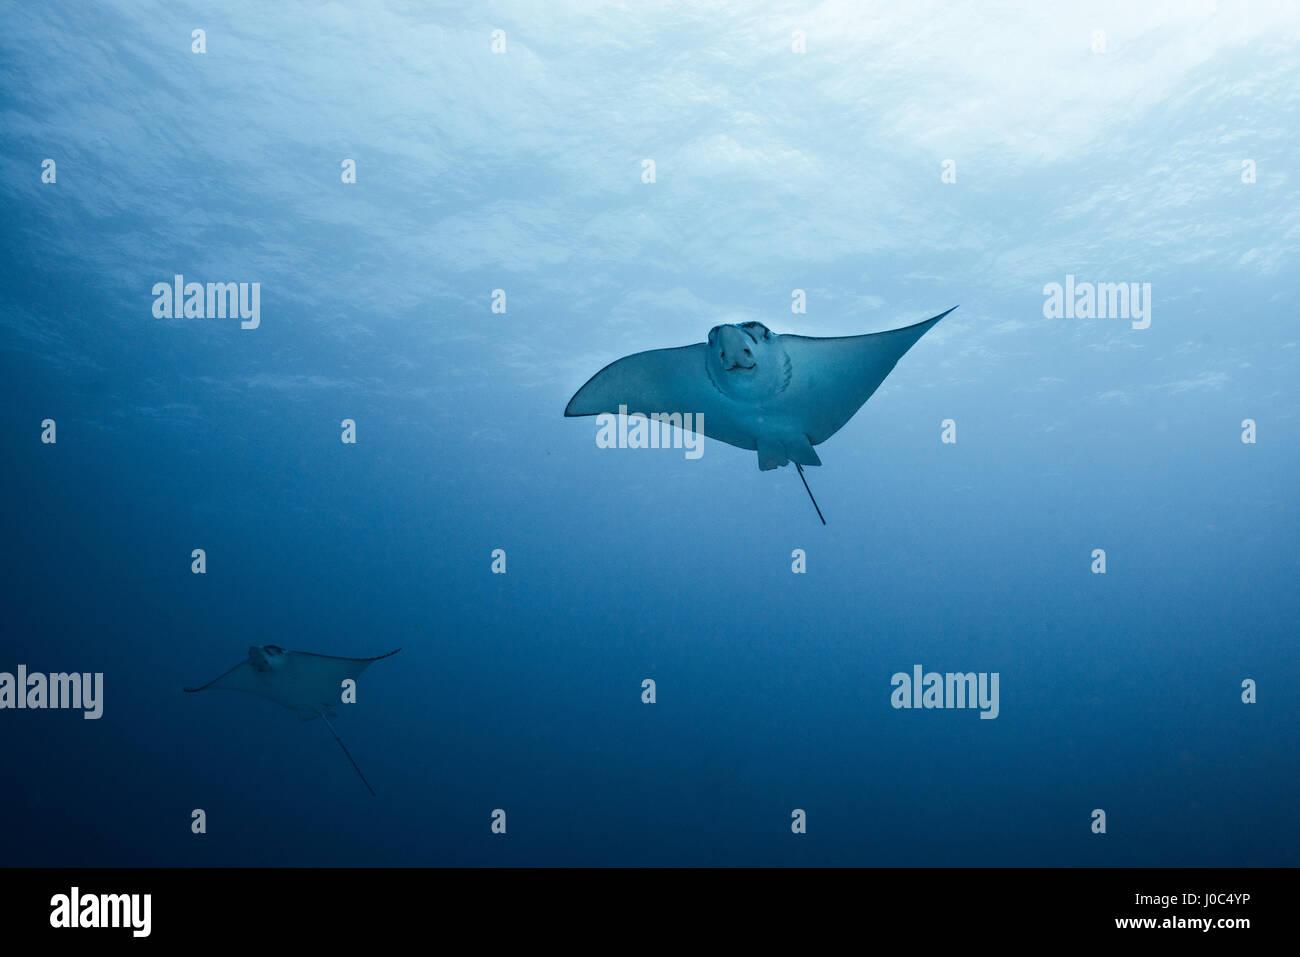 Pair of eagle rays (aetobatus narinari) swimming, underwater view,  Cancun, Mexico - Stock Image